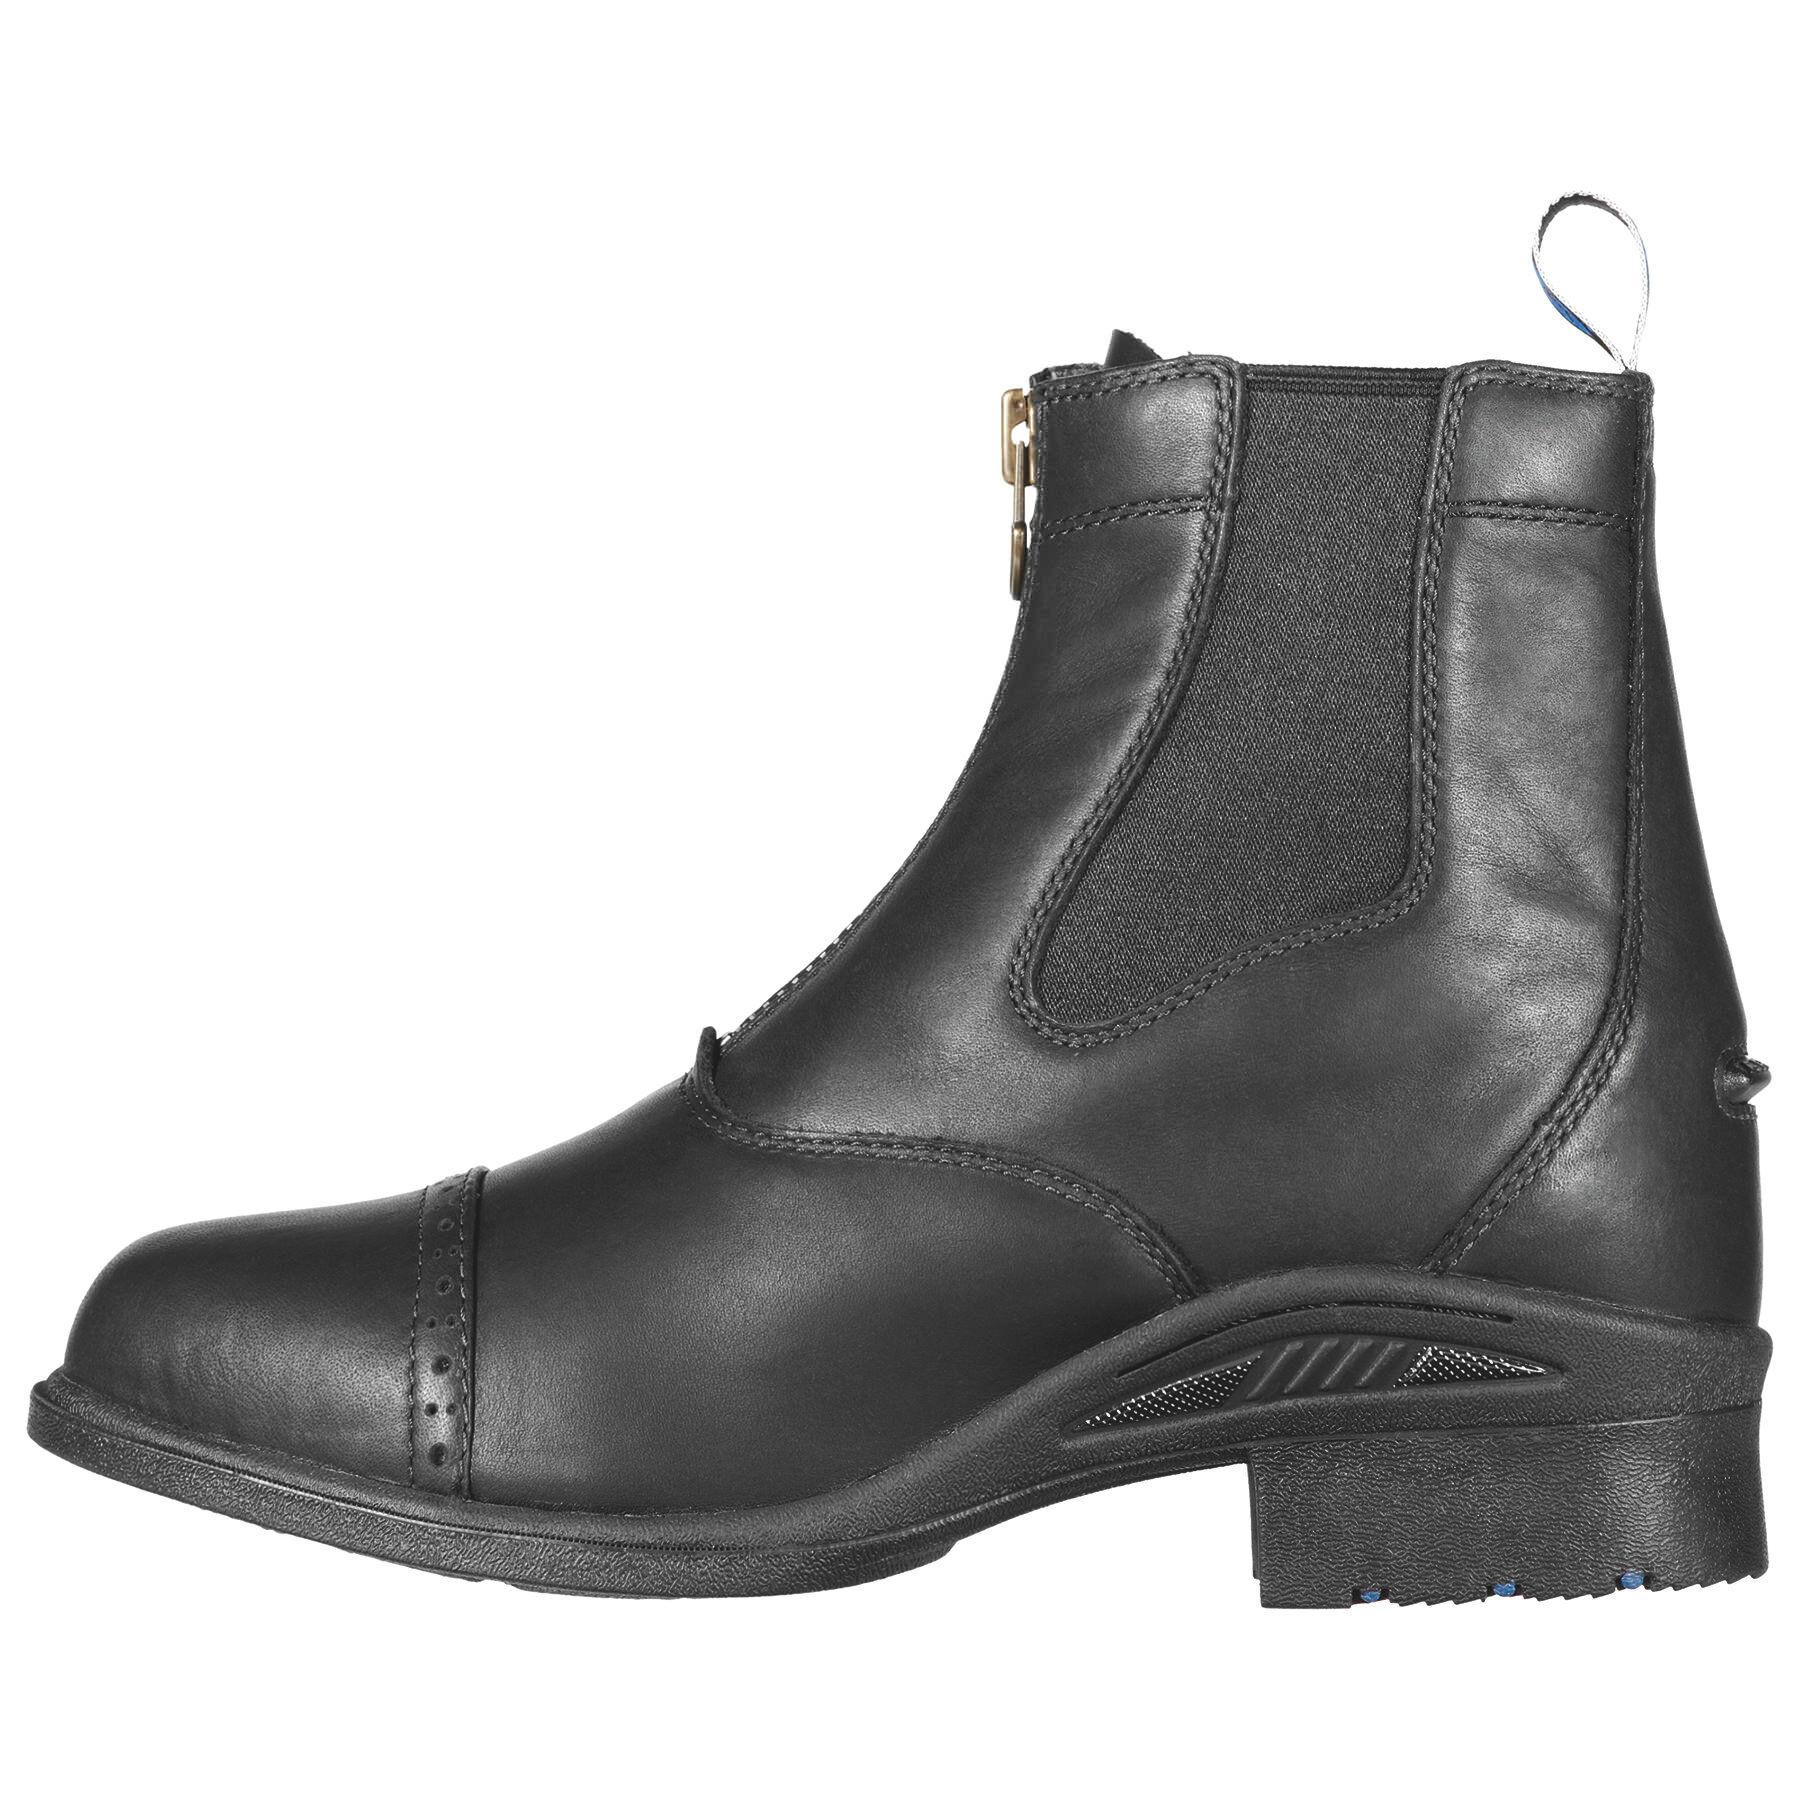 Ariat Cobalt VX Devon Pro Mens Jodhpur Boots iPiBZAq